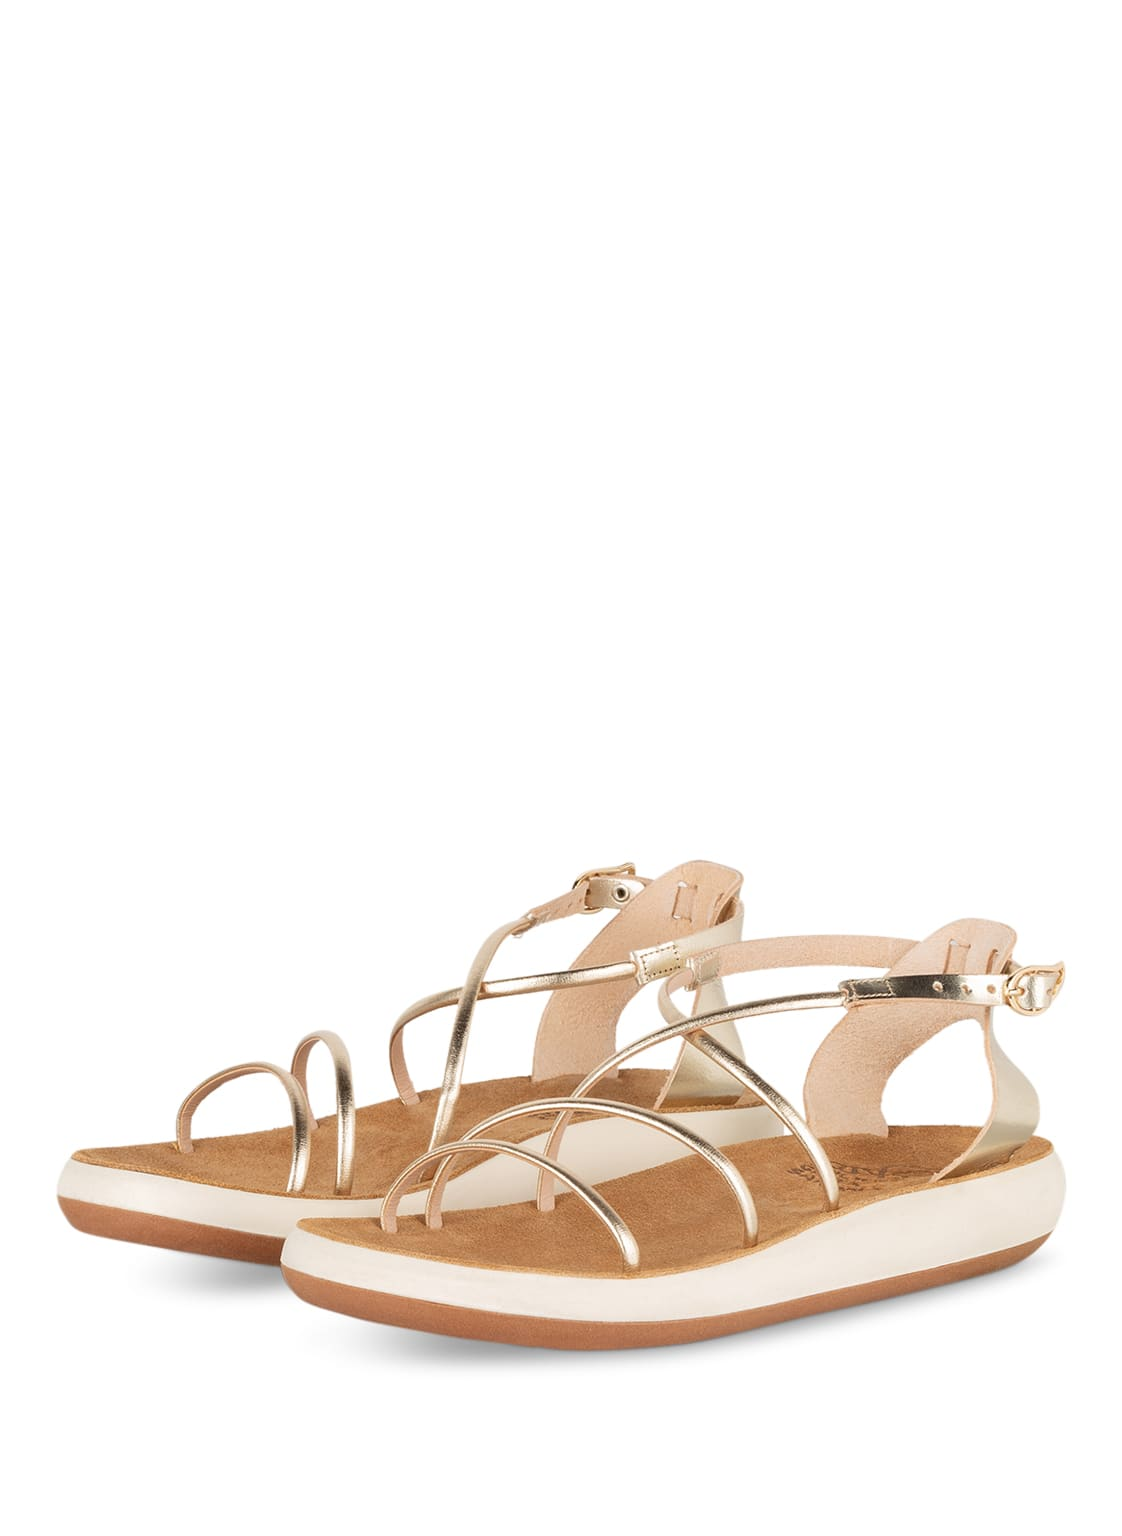 Image of Ancient Greek Sandals Sandalen Anastasia Comfort gold